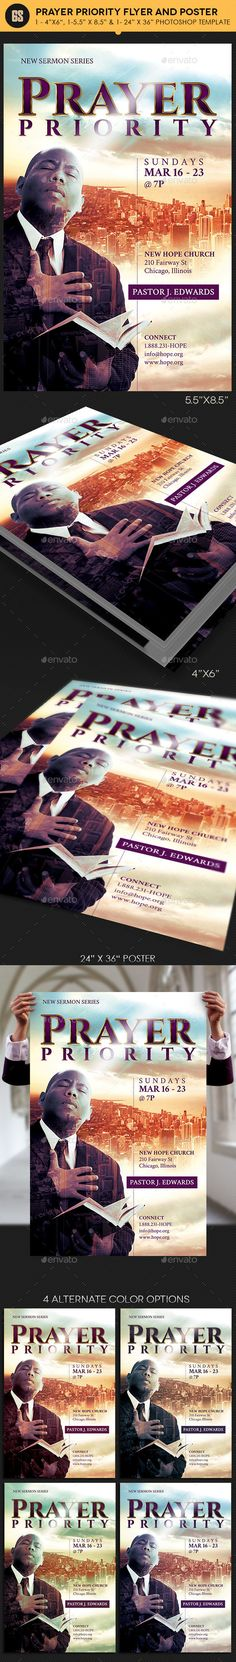 Prayer Meeting Church Flyer Template Youth camp, Flyer template - christian flyer templates